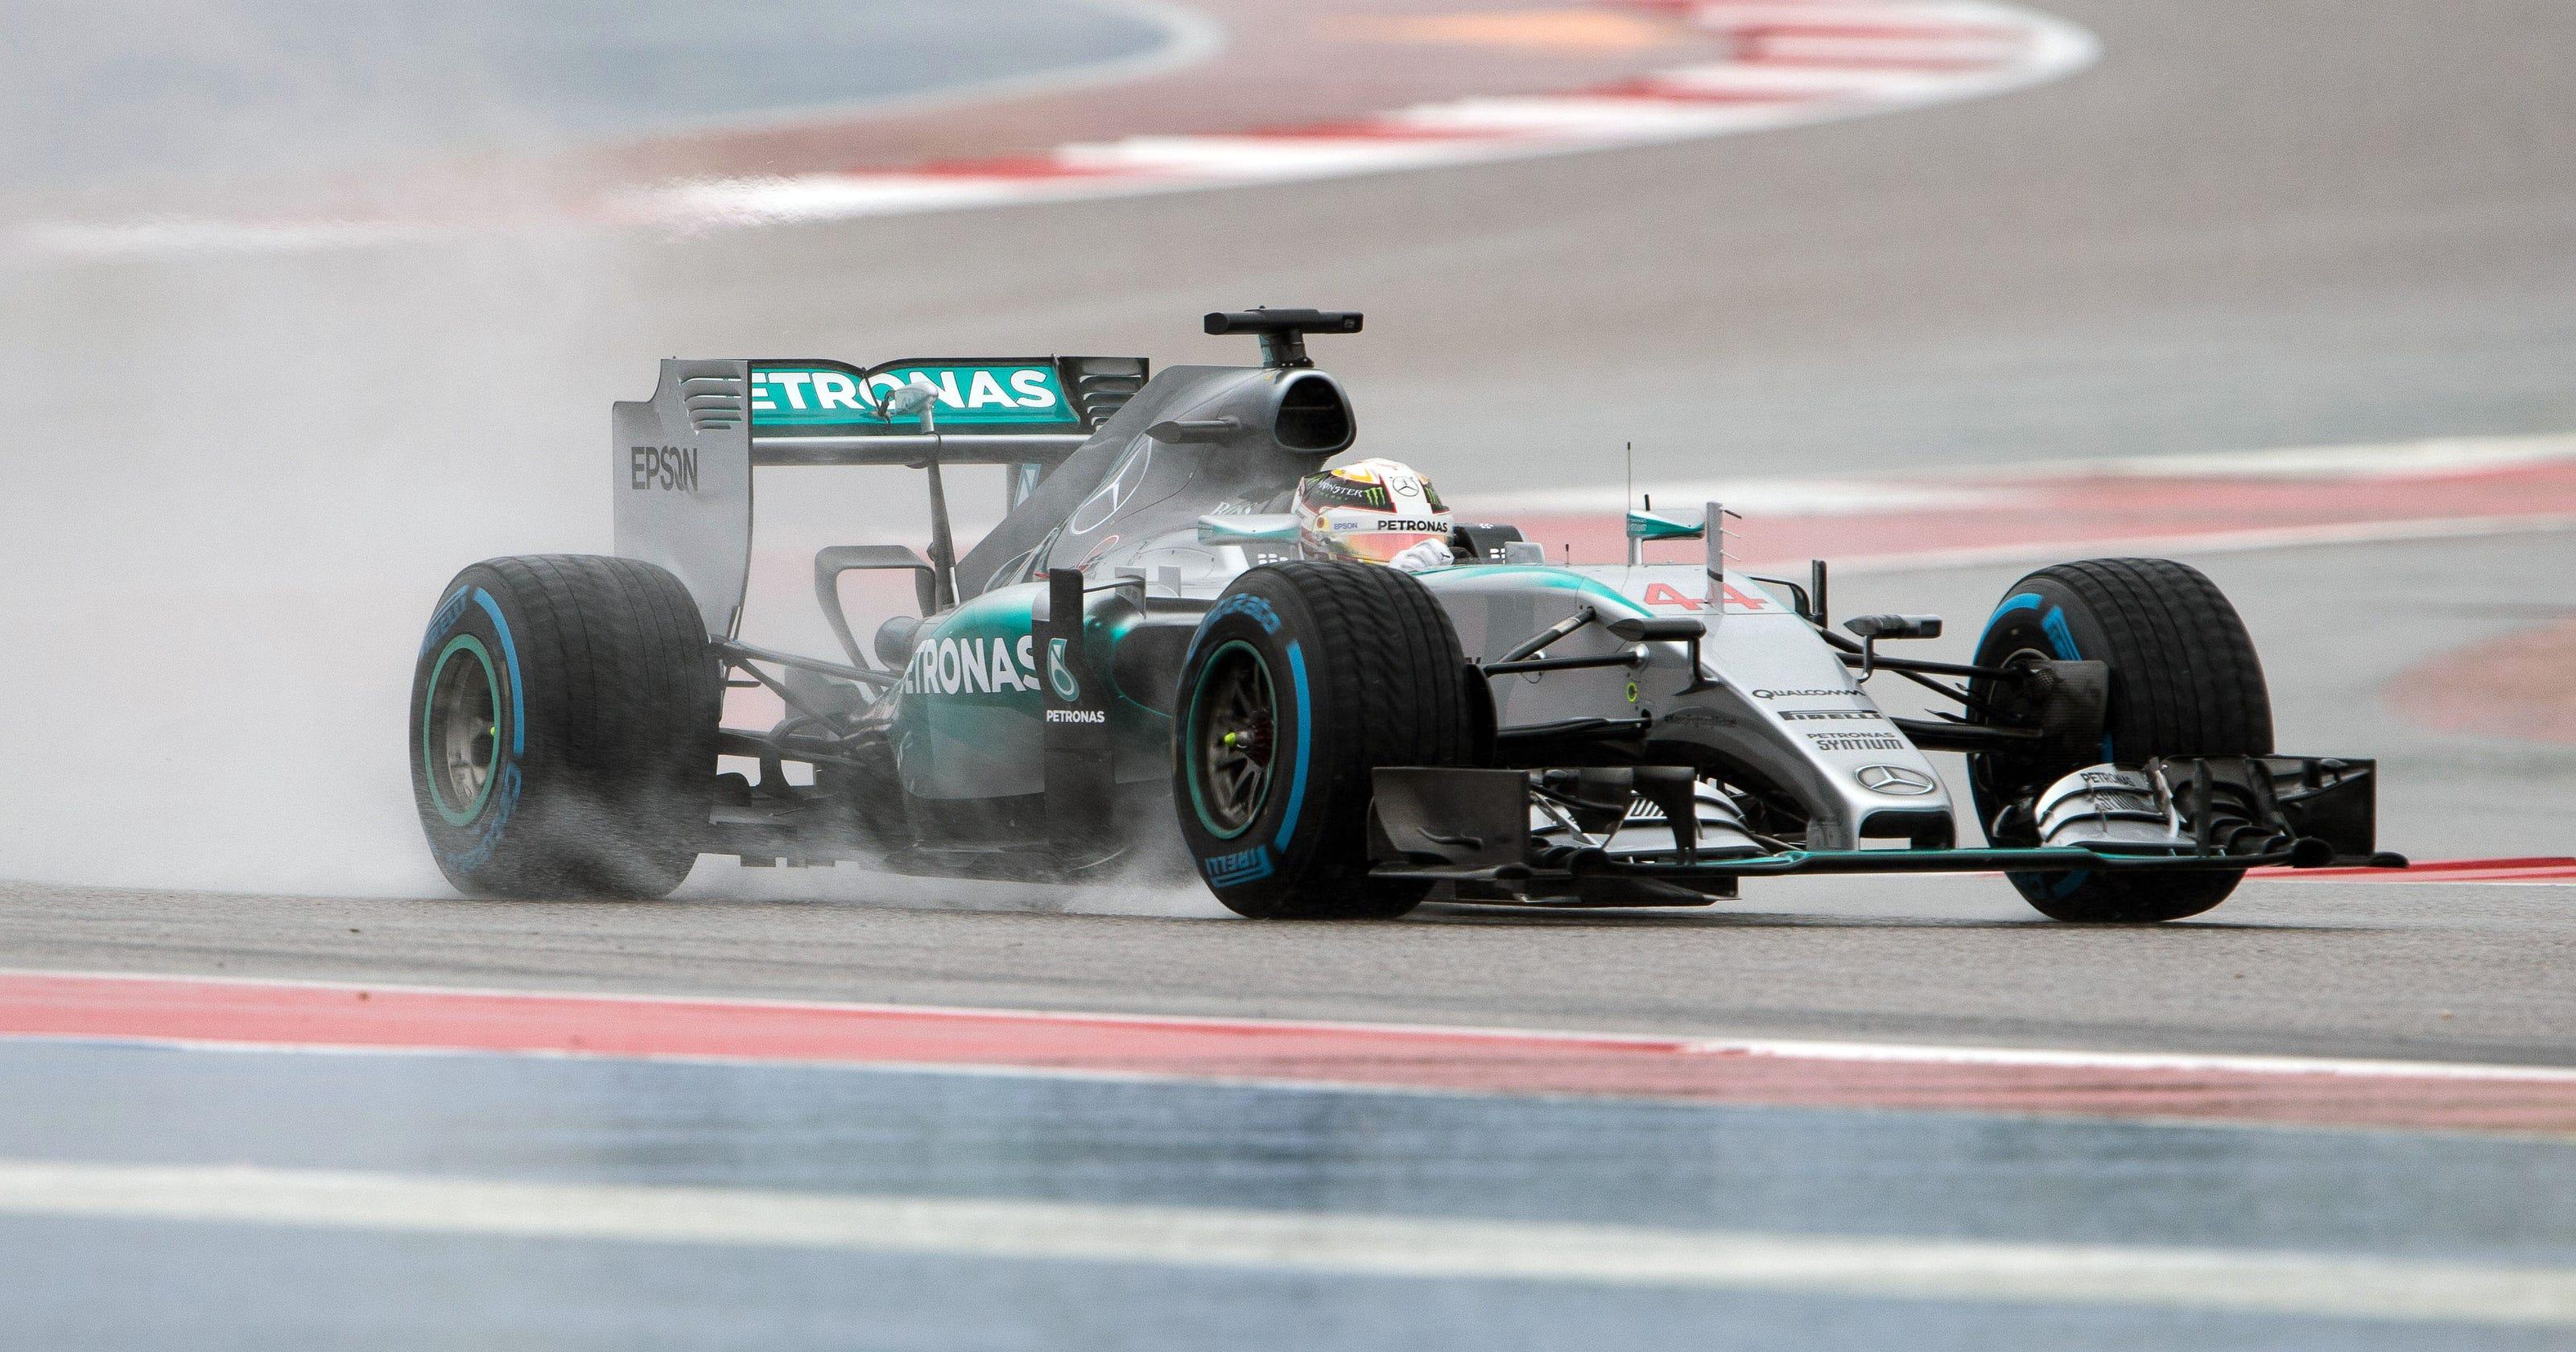 Us Grand Prix >> U S Grand Prix Subject To Agreement On 2016 Formula 1 Calendar